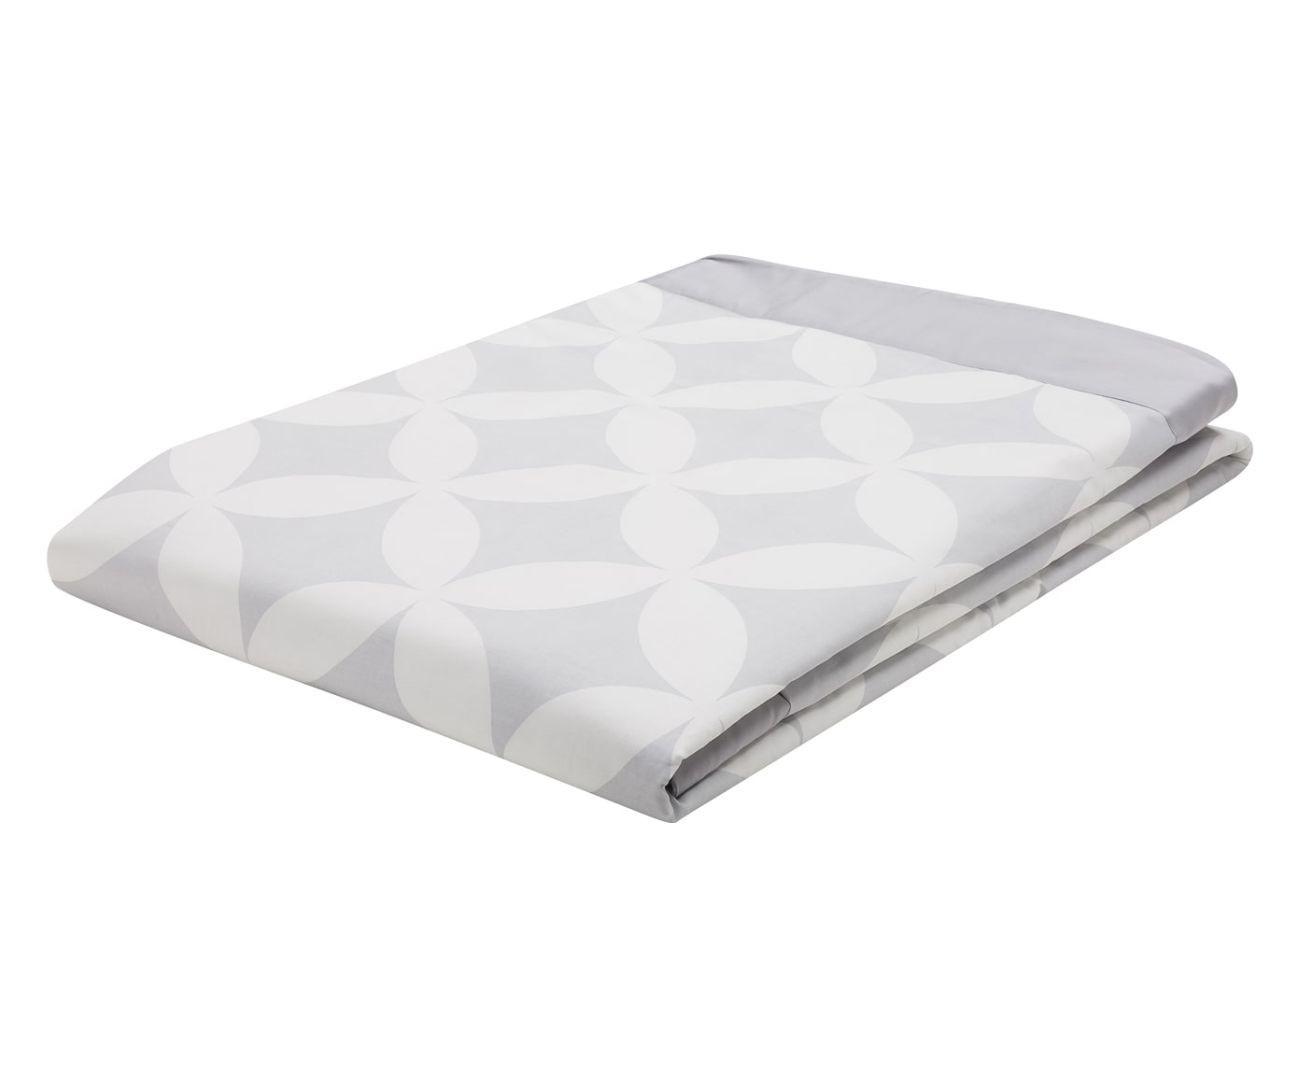 peppa grace elda tagesdecke online kaufen bei woonio. Black Bedroom Furniture Sets. Home Design Ideas